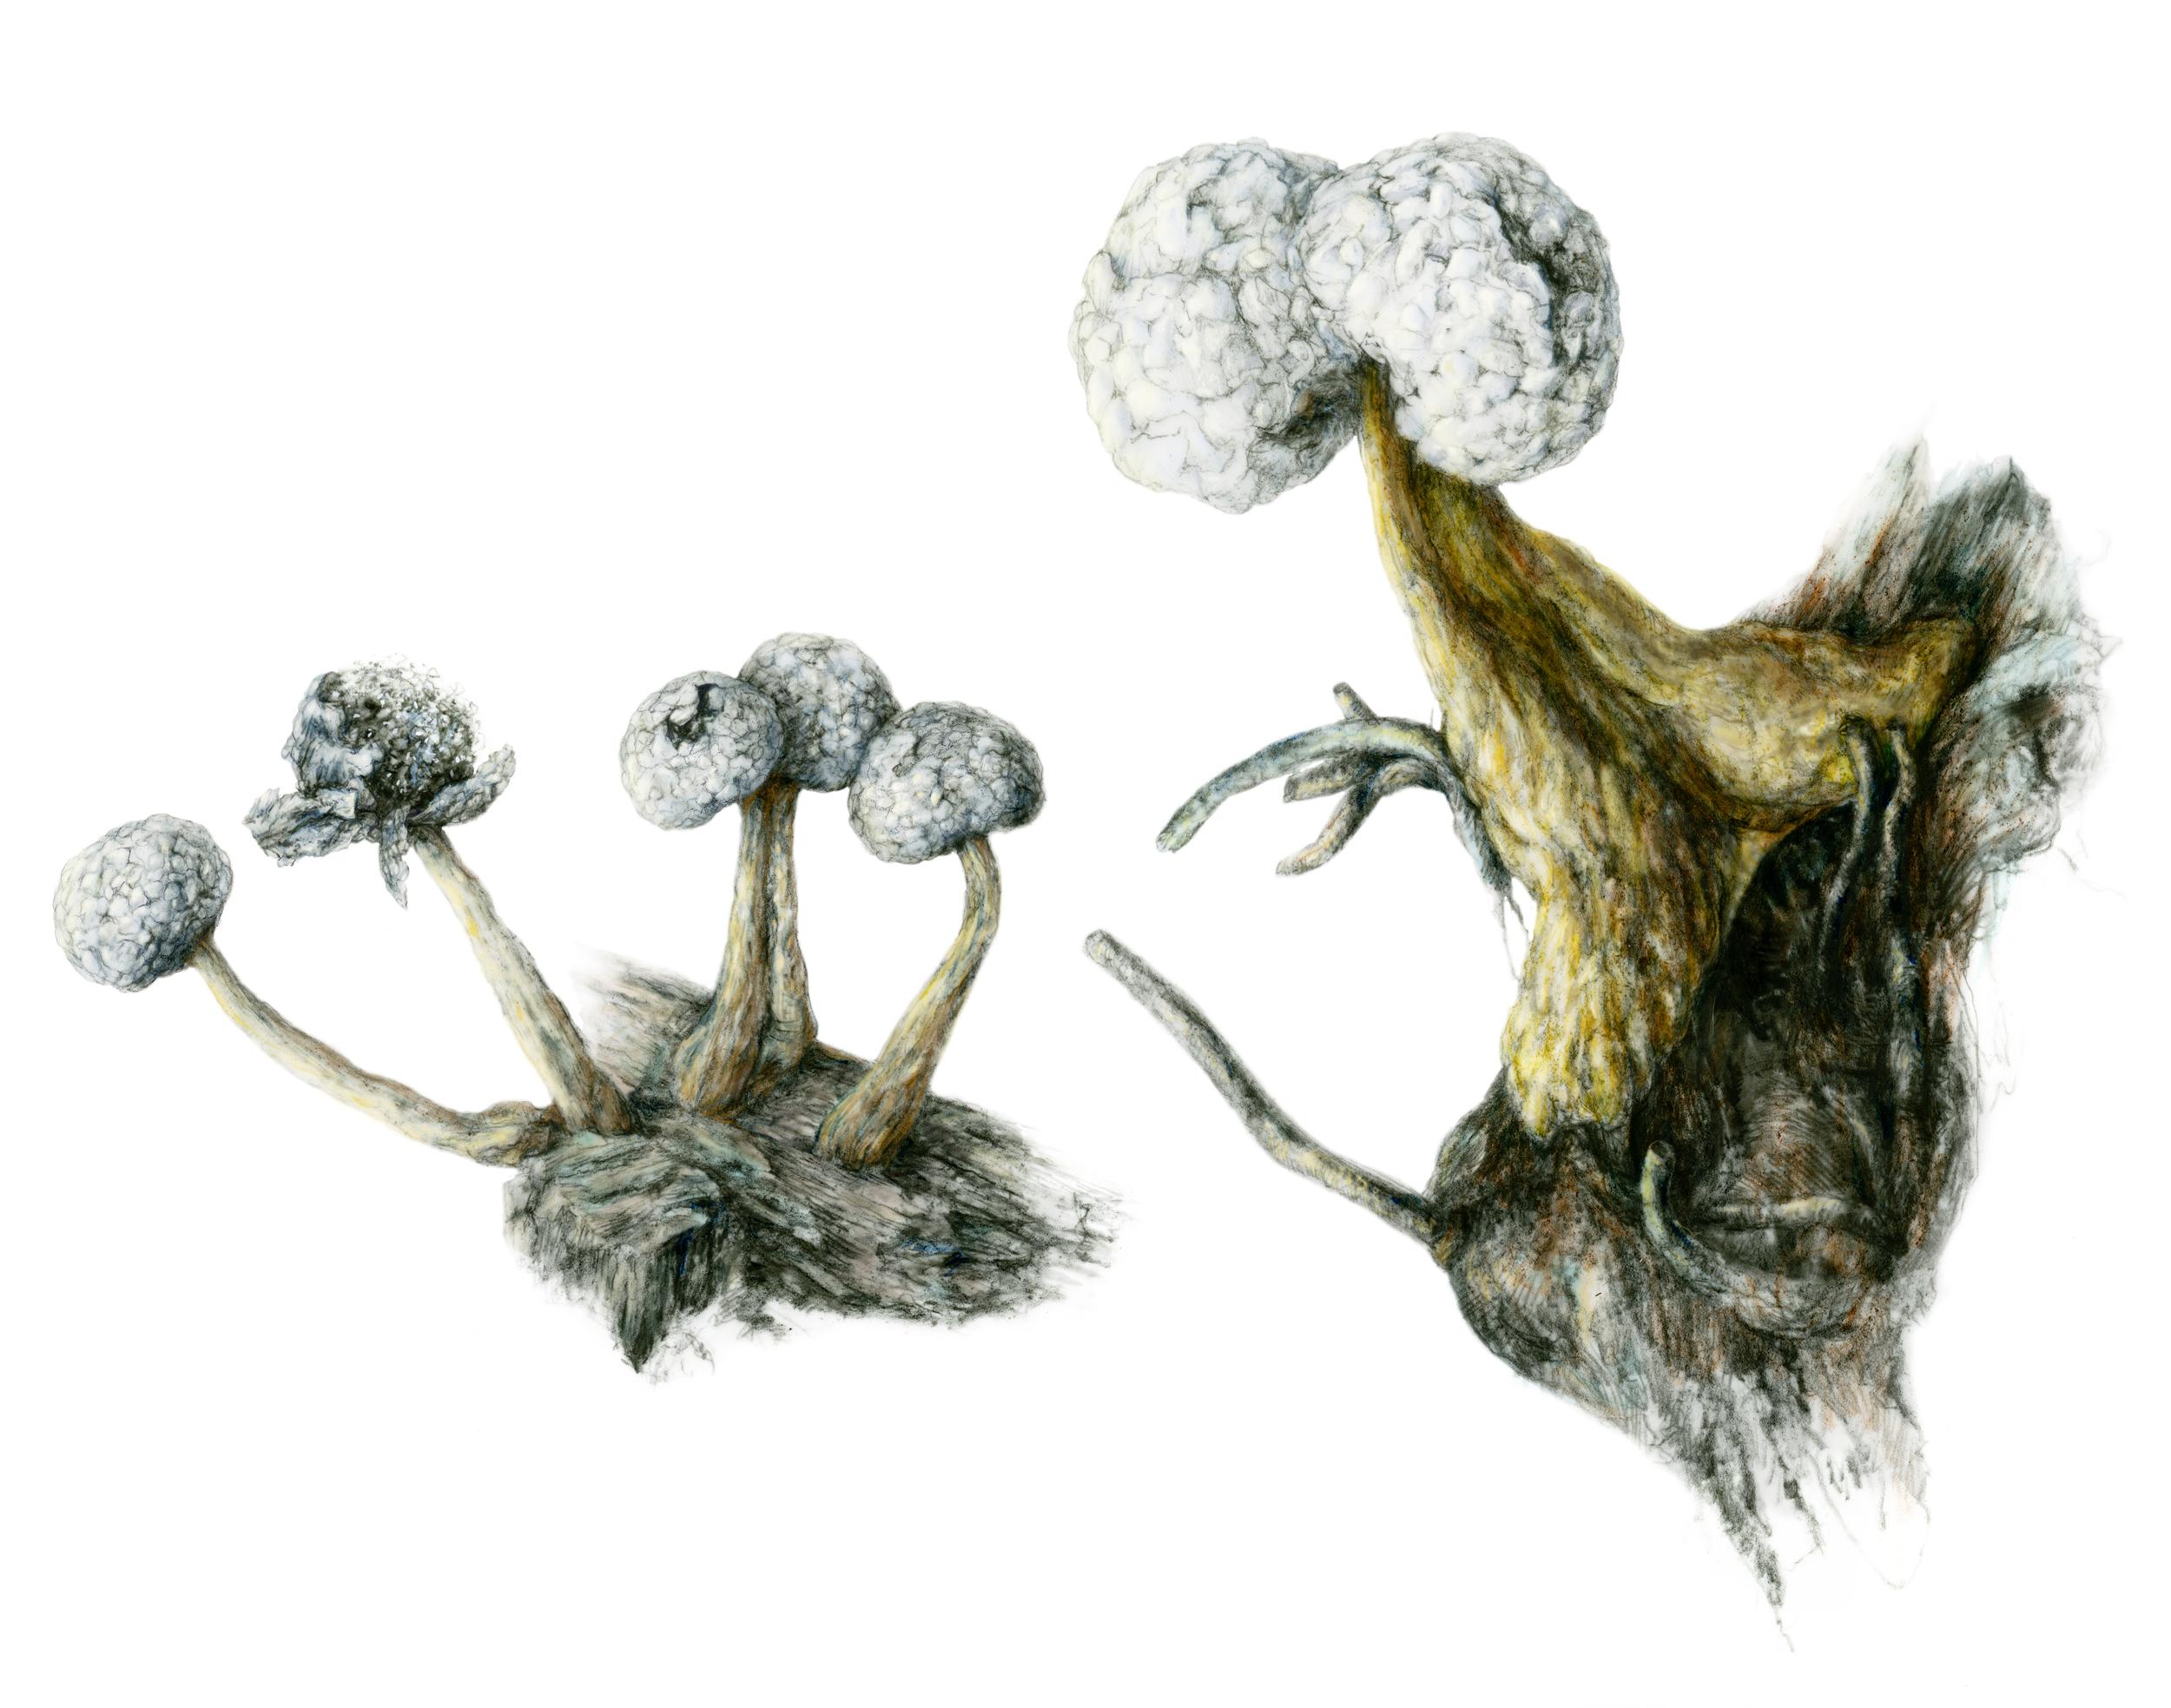 My representation of Physarum globuliferum